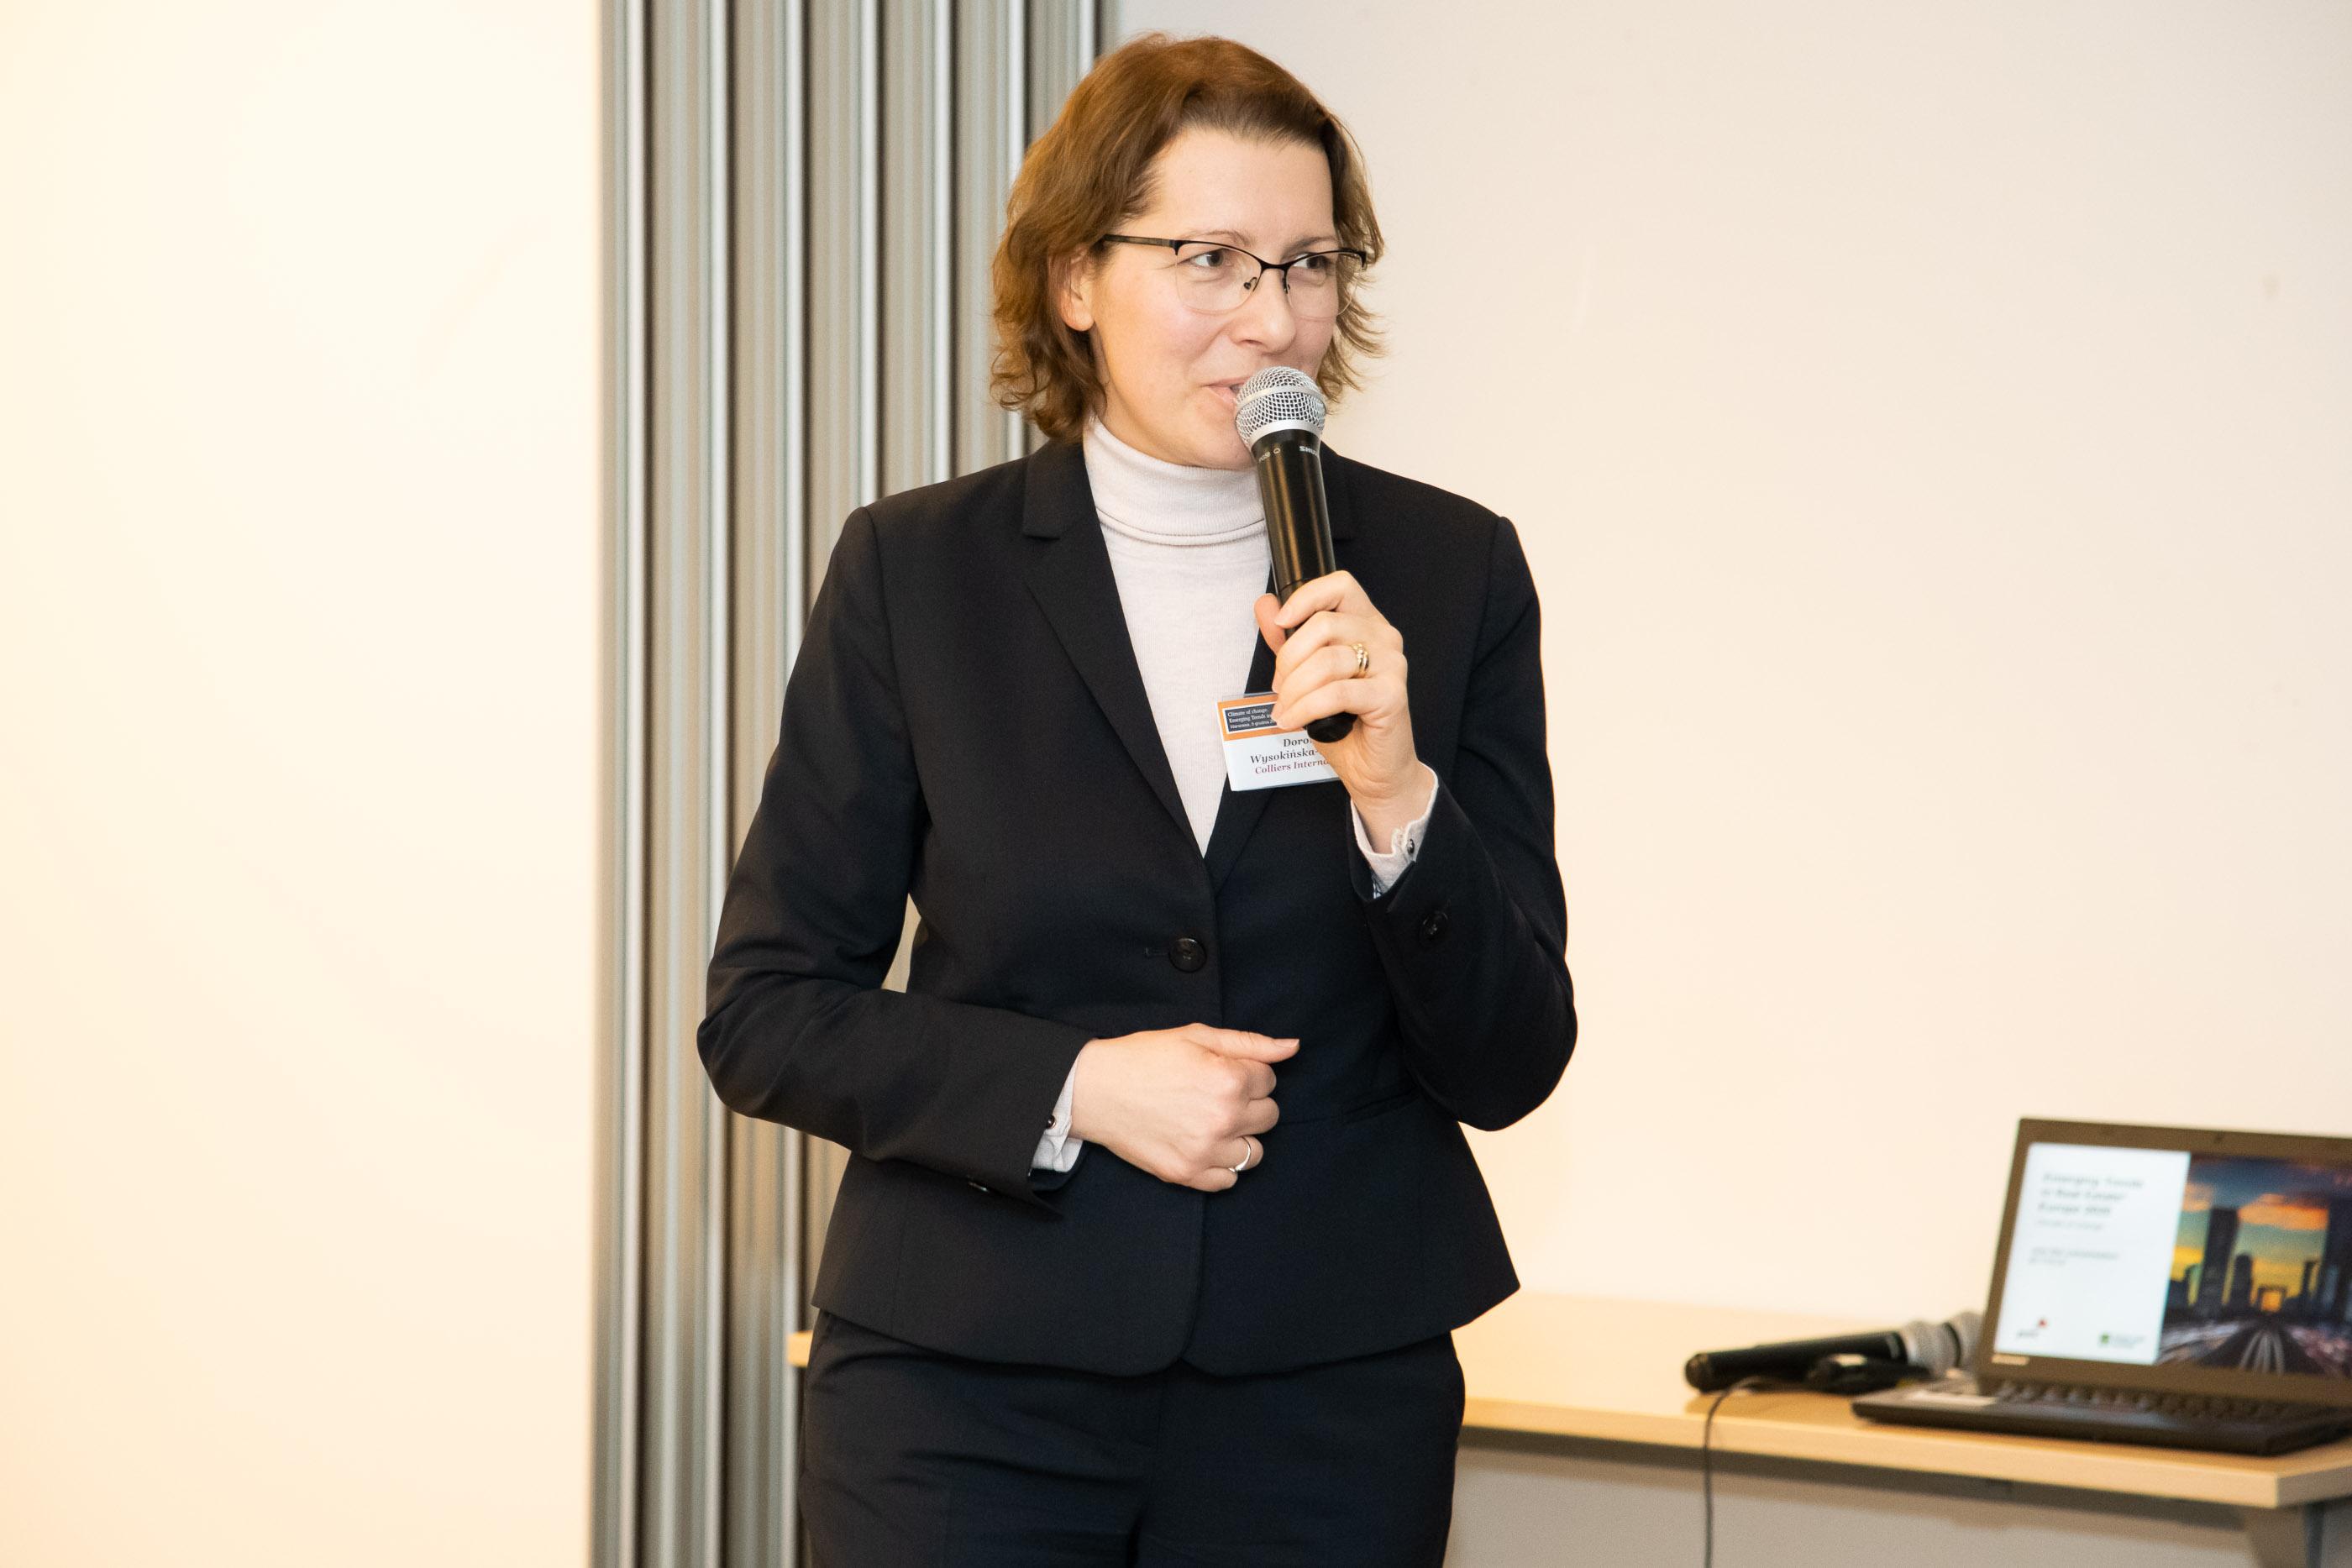 Dorota Wysokińska-Kuzdra, ULI Poland